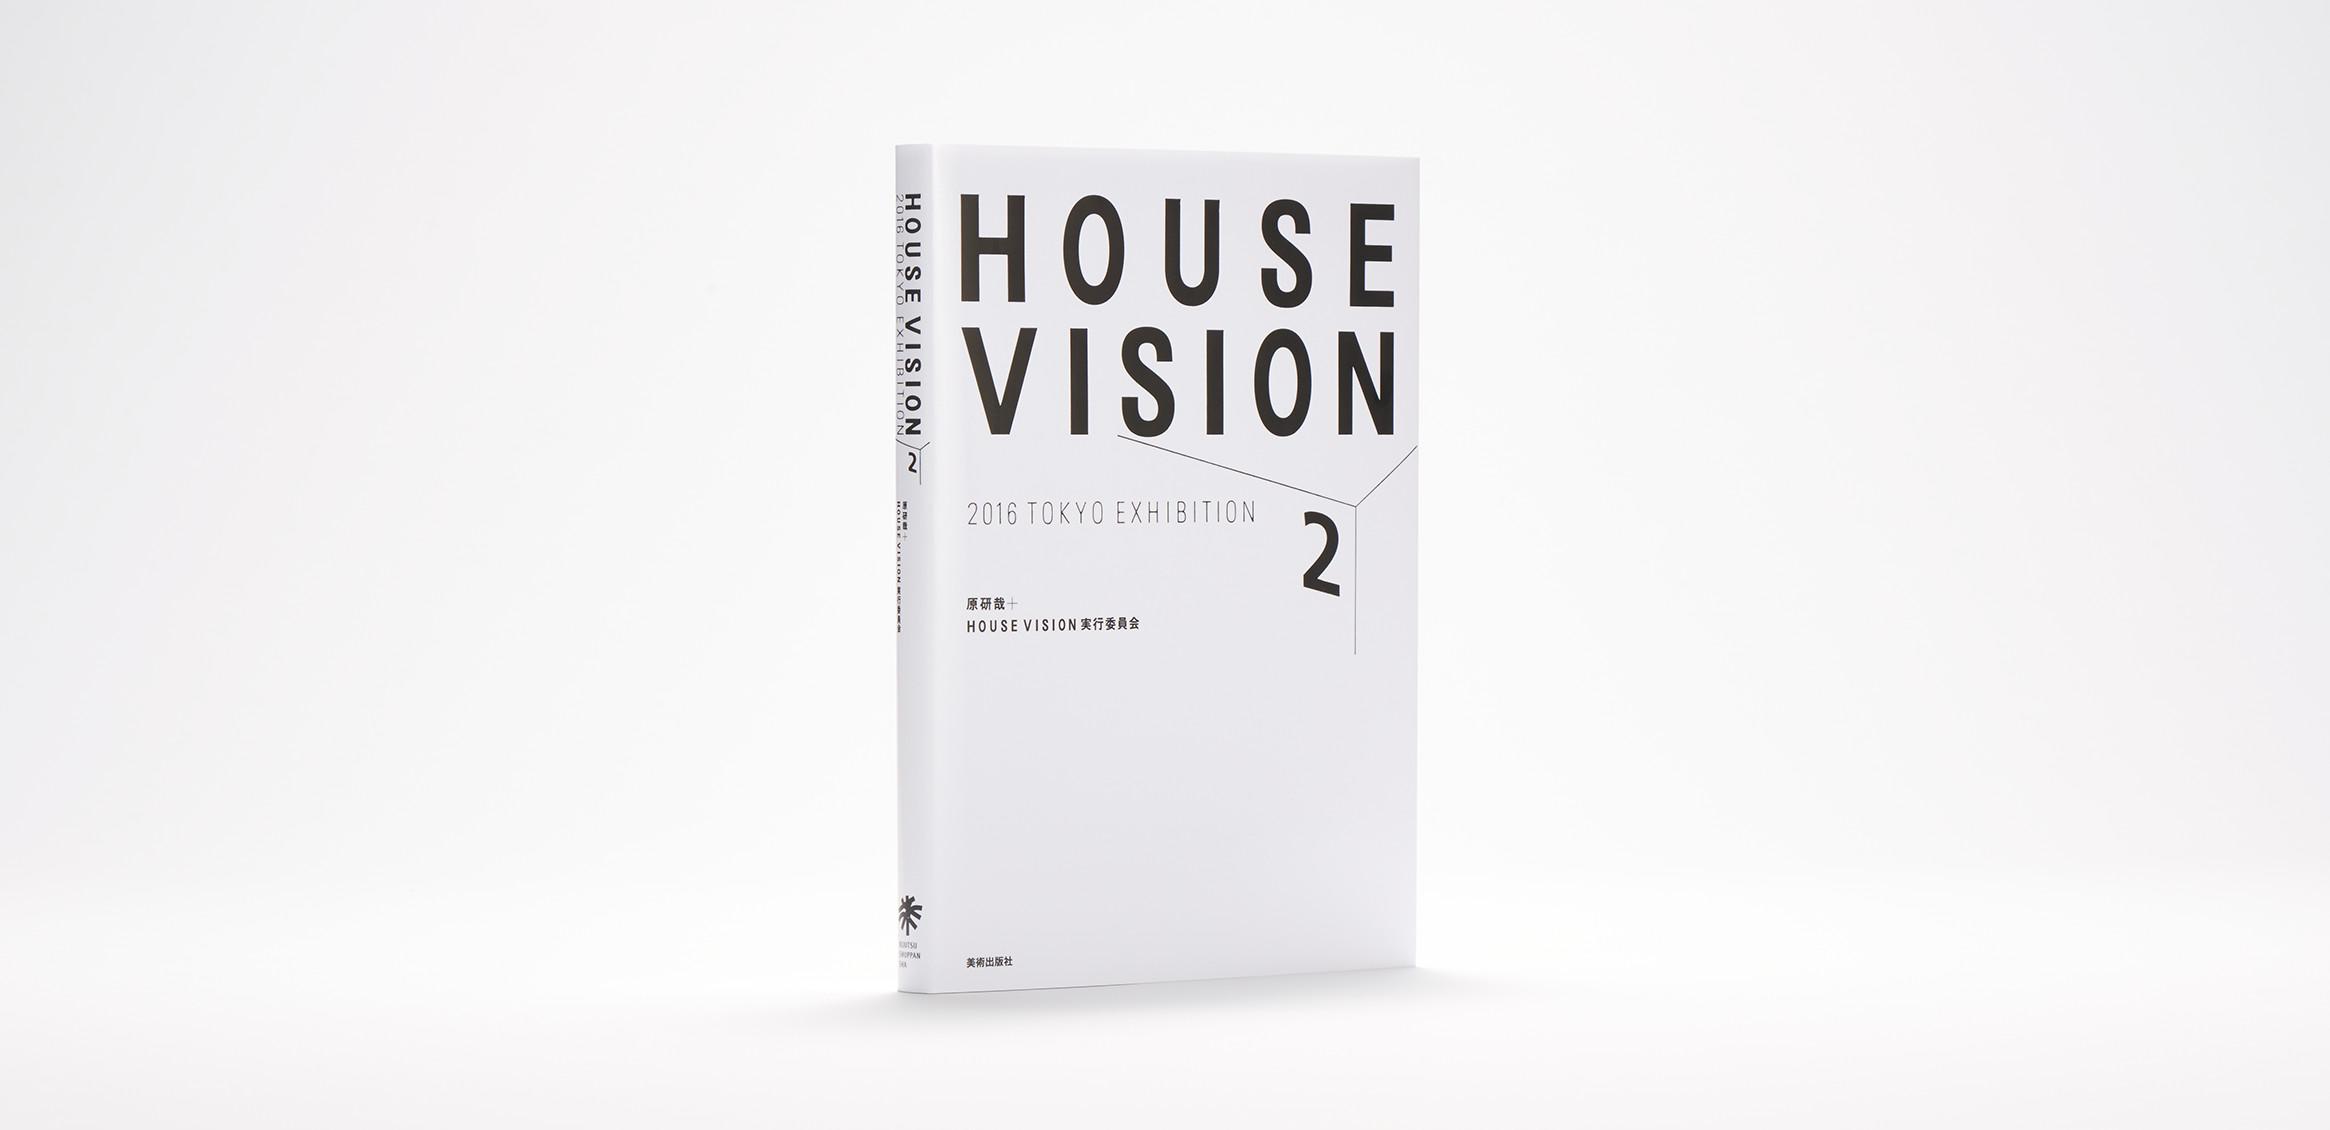 HOUSE VISION 2 2016 TOKYO EXHIBITION0枚目